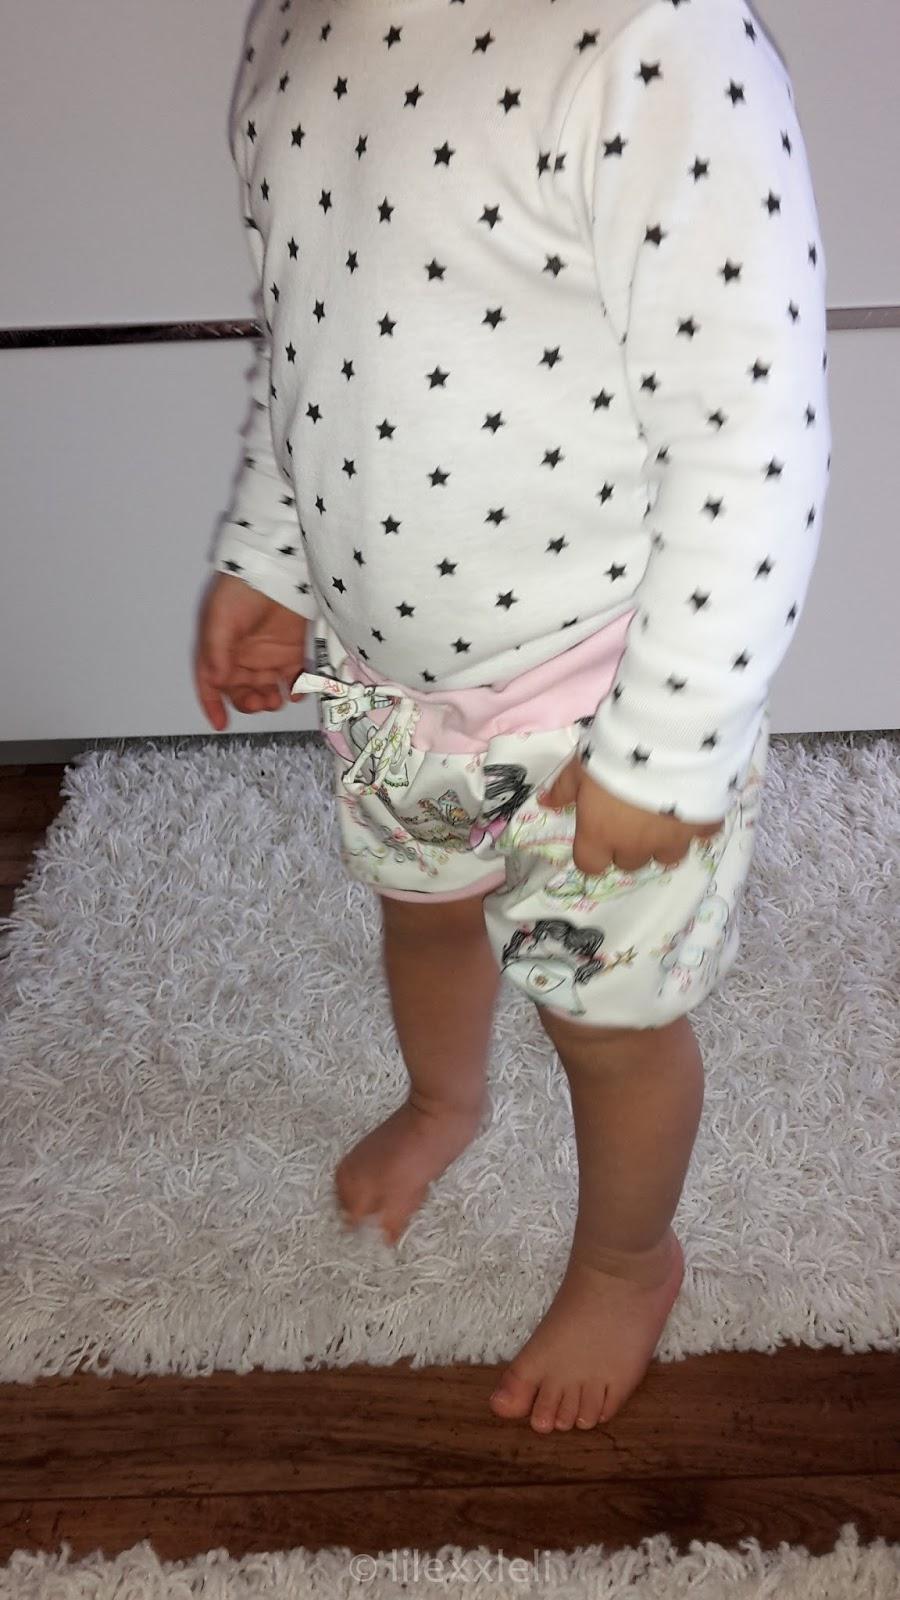 Lilexxleli: Im Jumpsuit-Fieber - Jumpsuit de lüdde Sünnschien